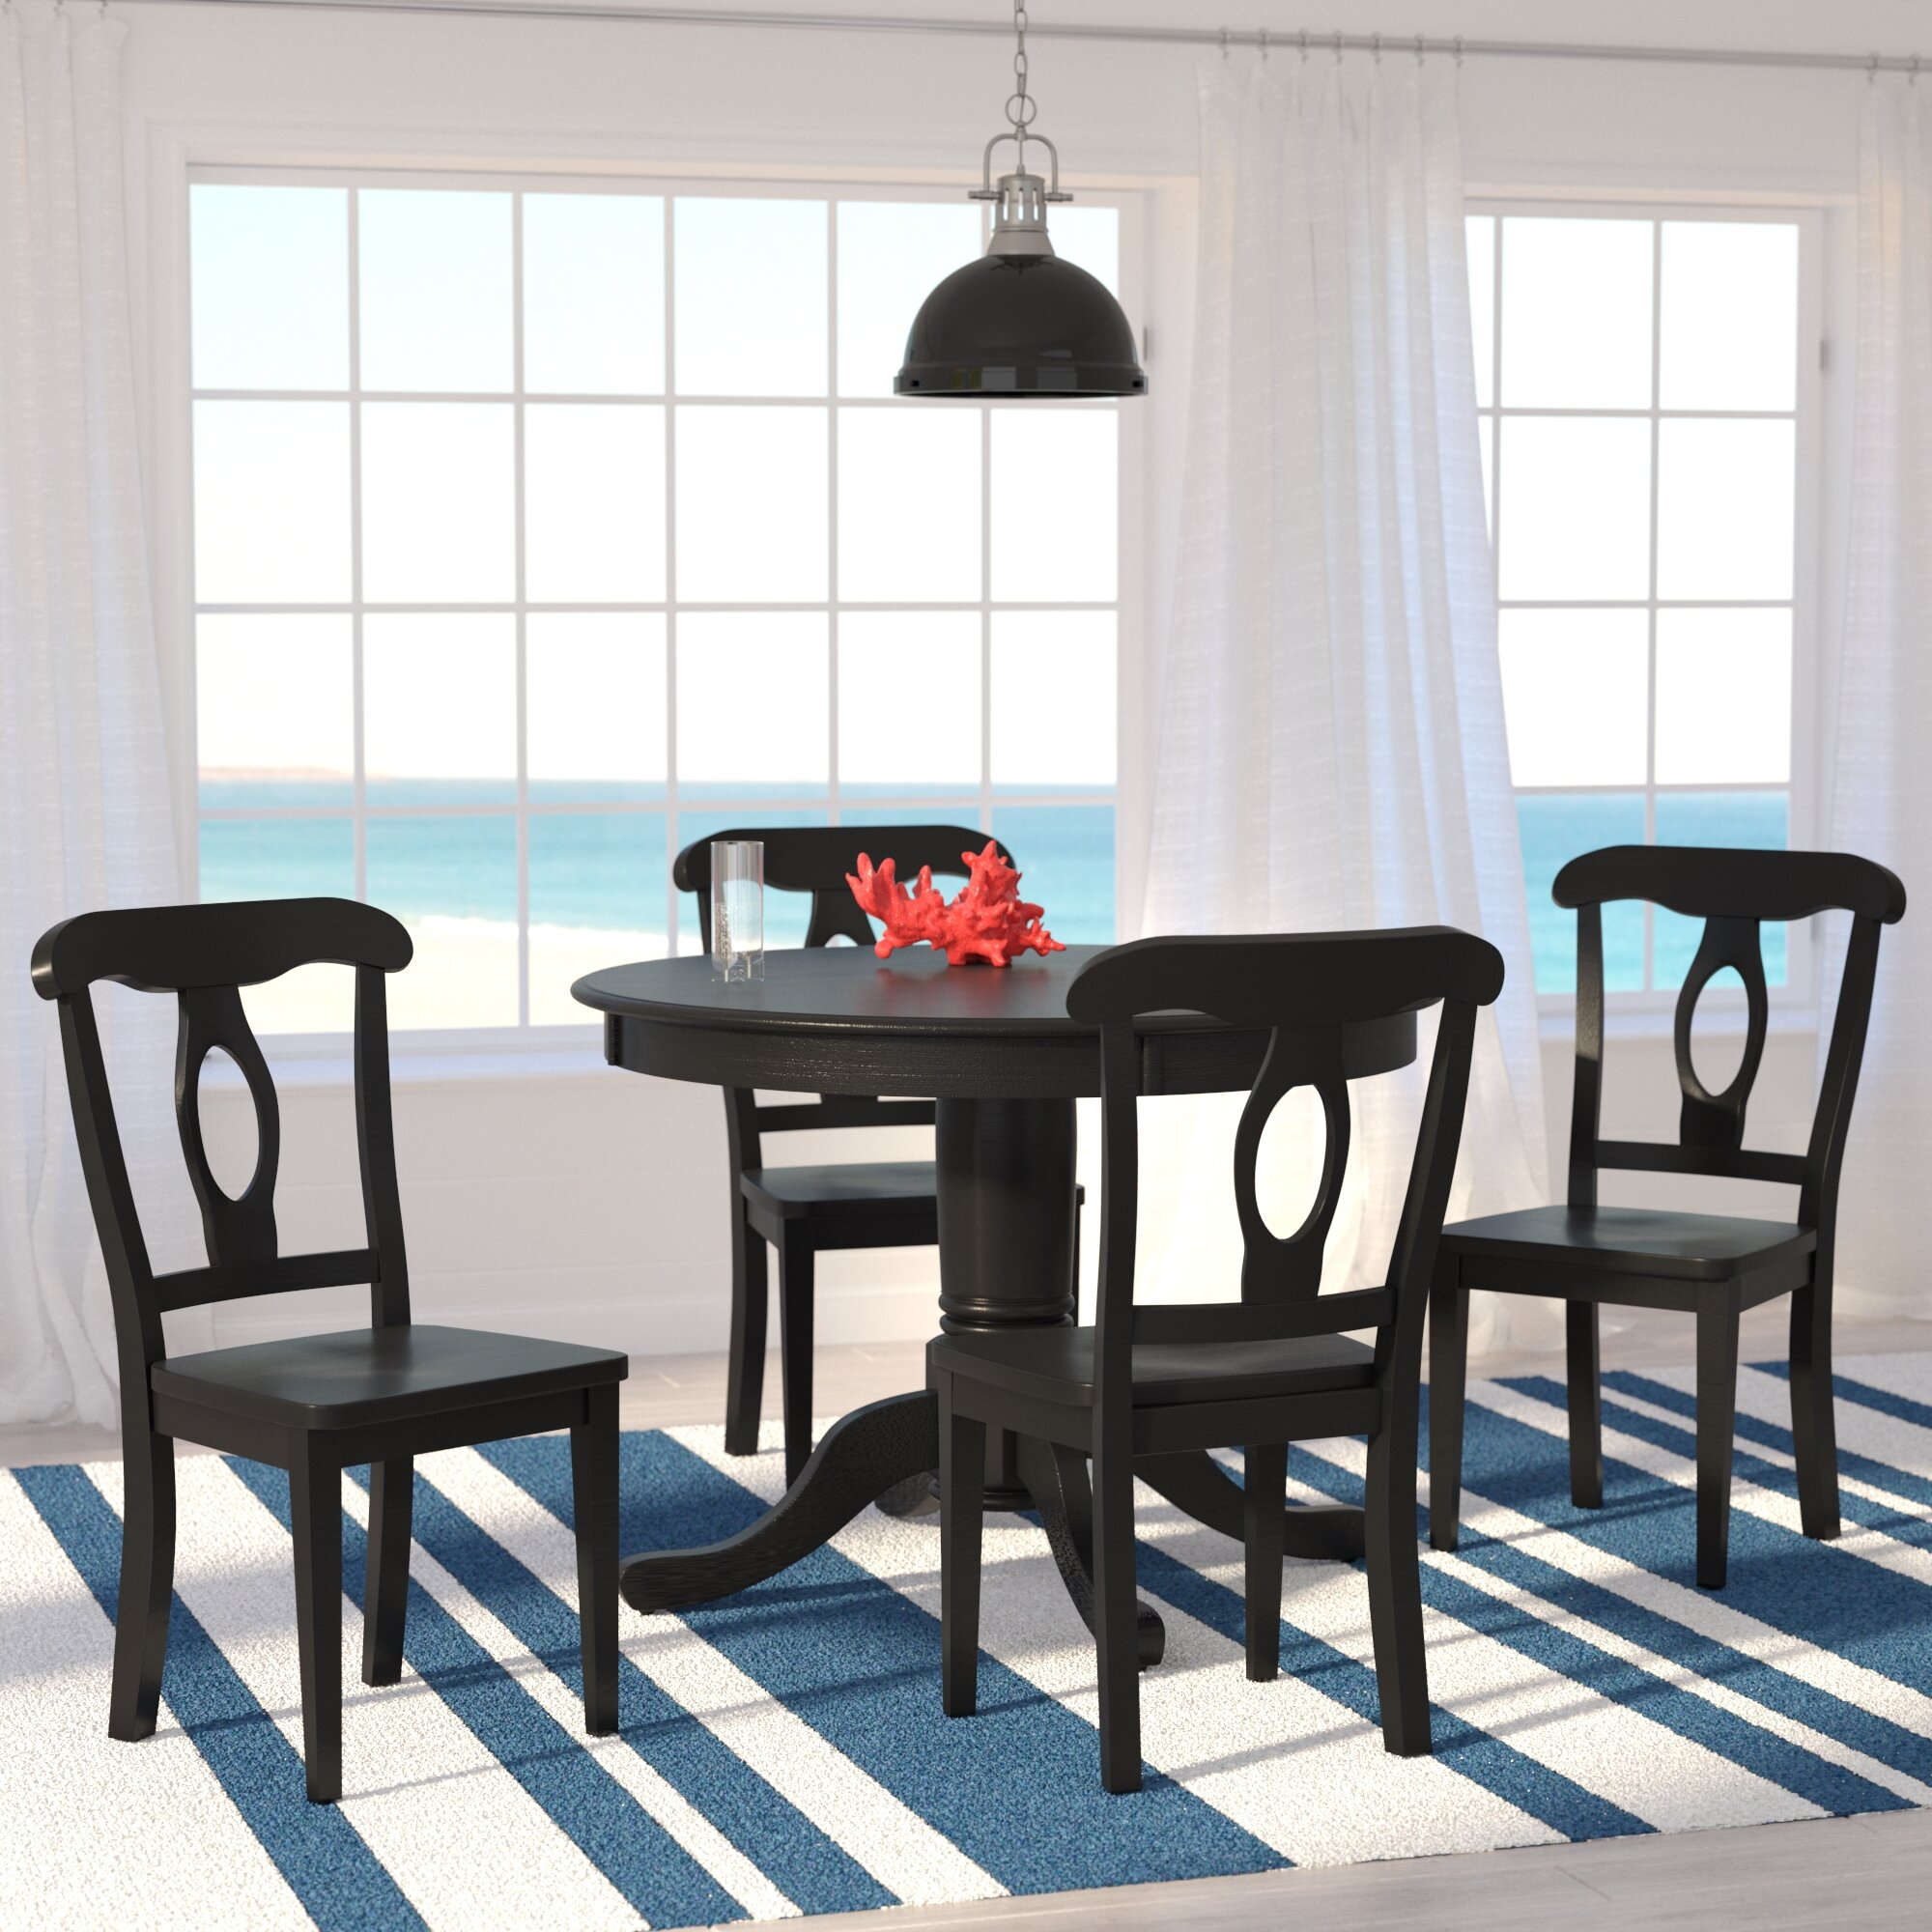 Charmant Beachcrest Home Gaskell 5 Piece Dining Set U0026 Reviews   Wayfair